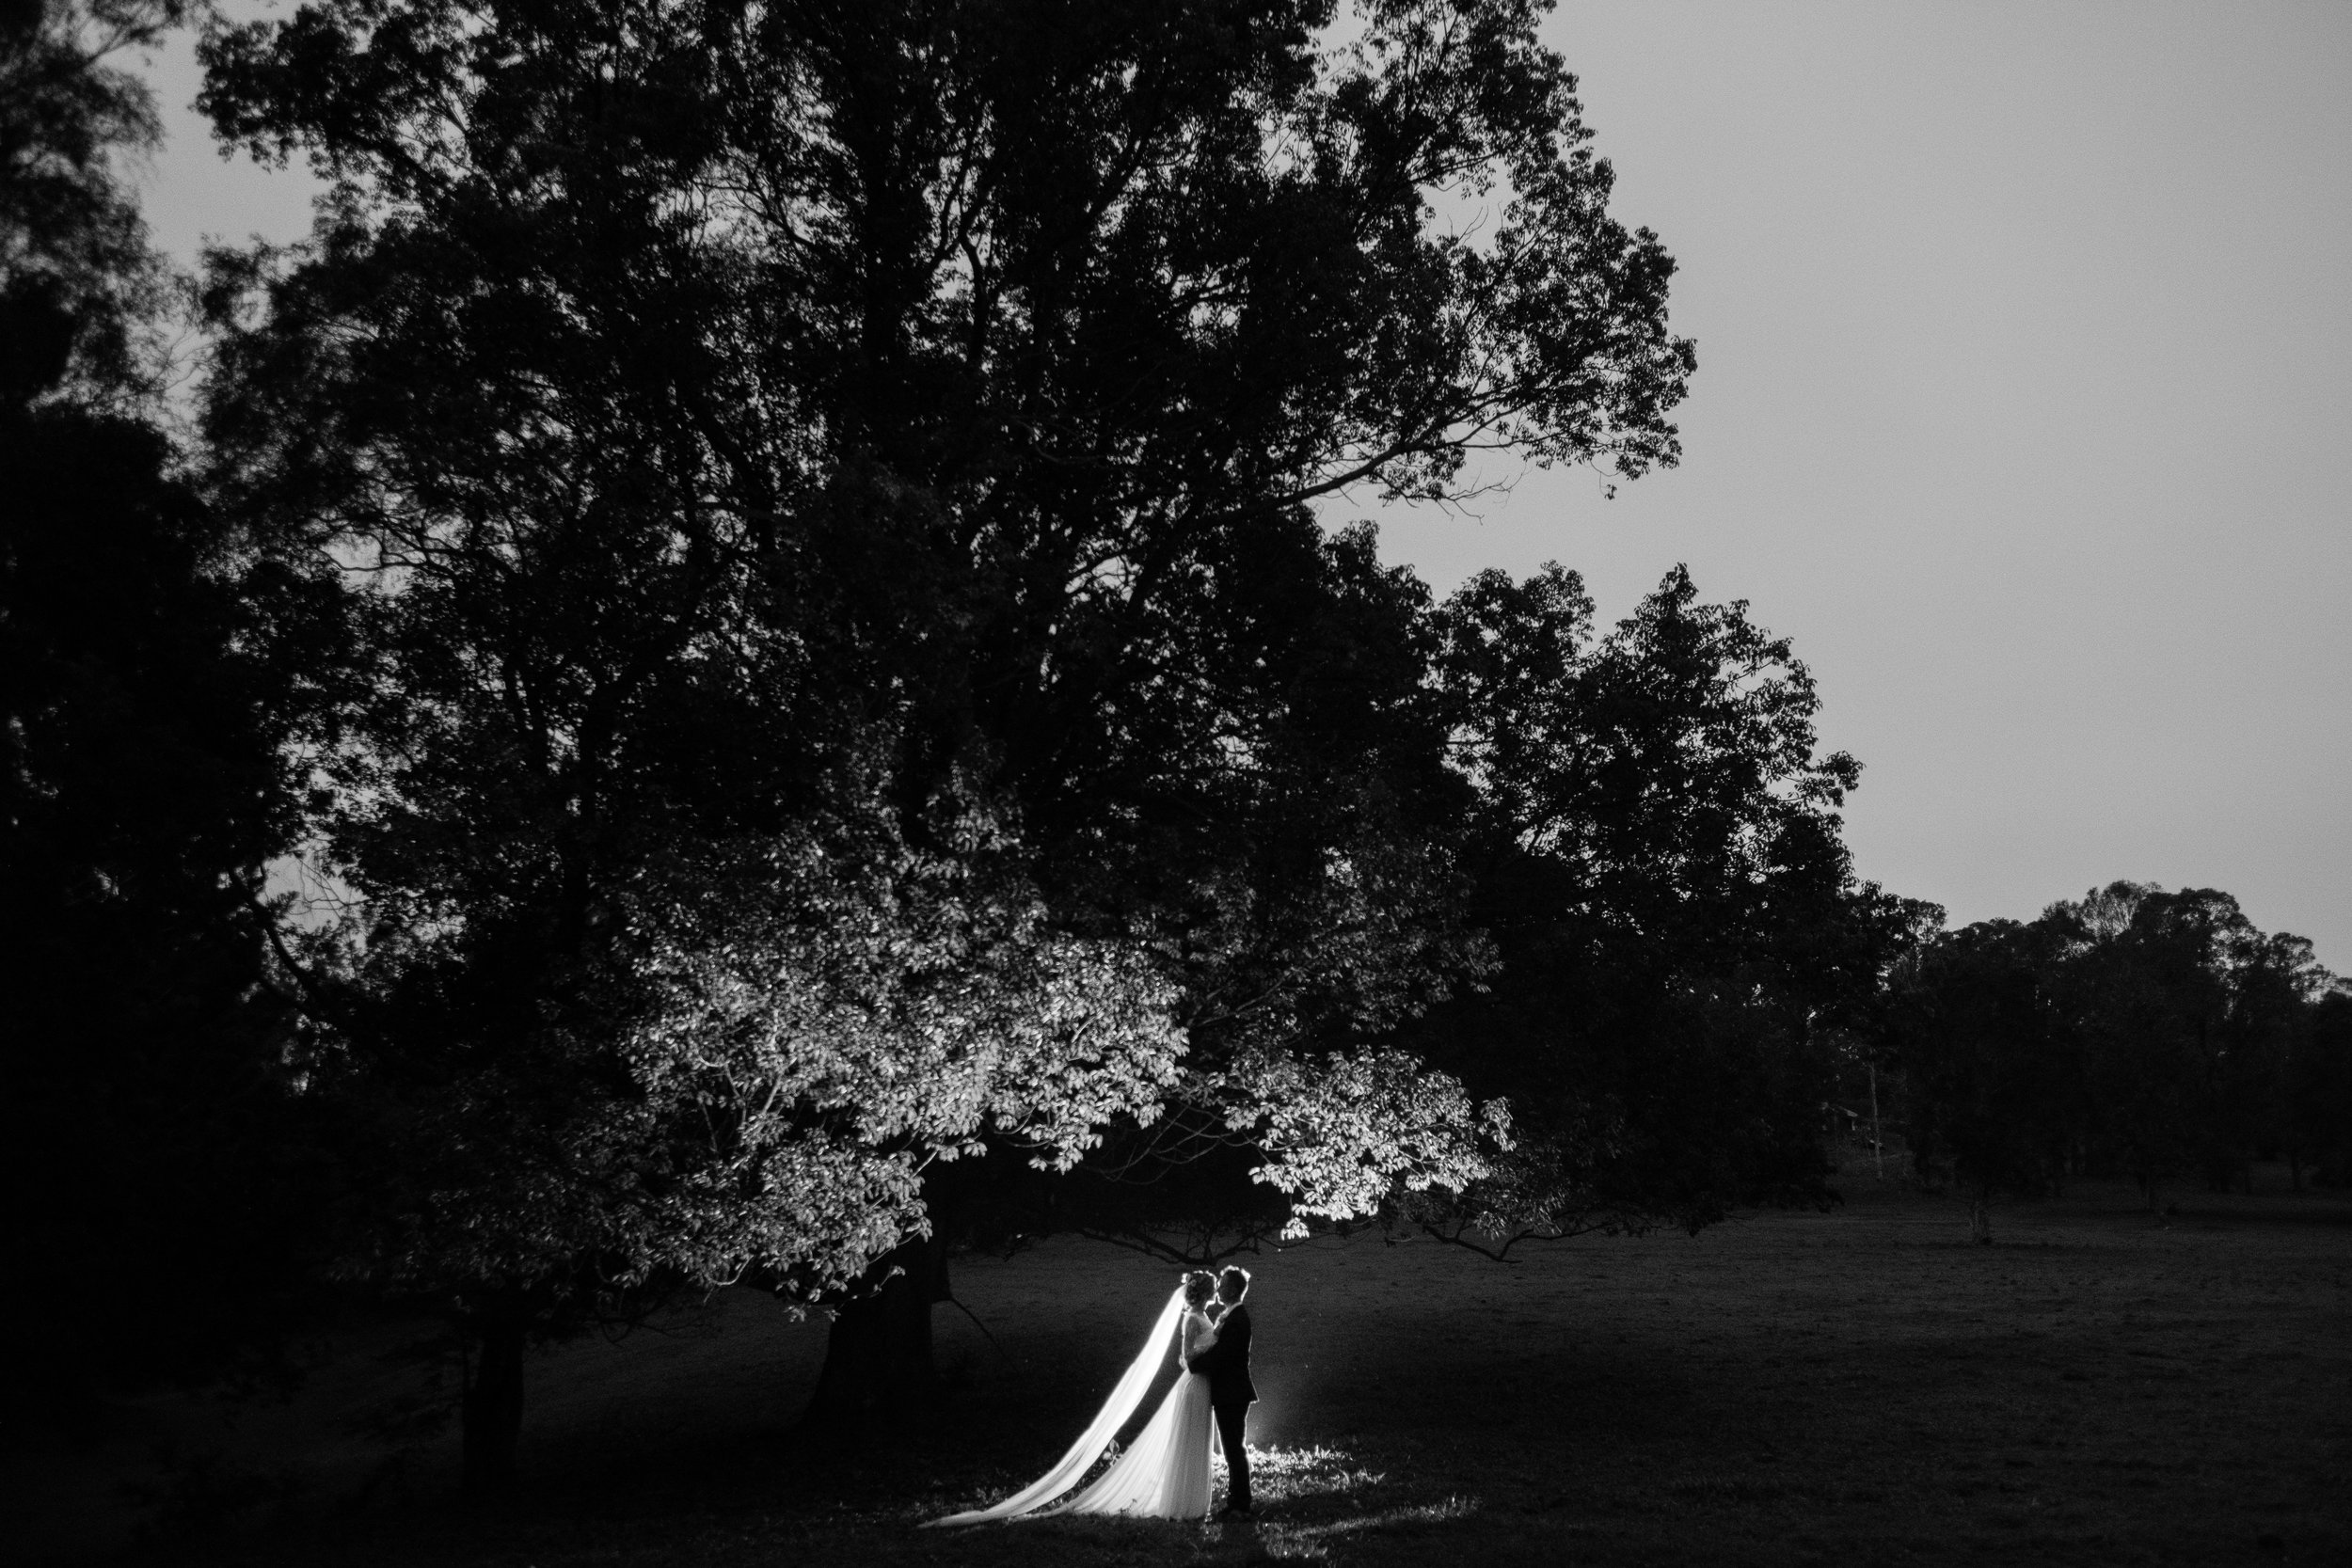 brisbane-gold-coast-sunshine-coast-romantic-wedding-photographer-76.jpg